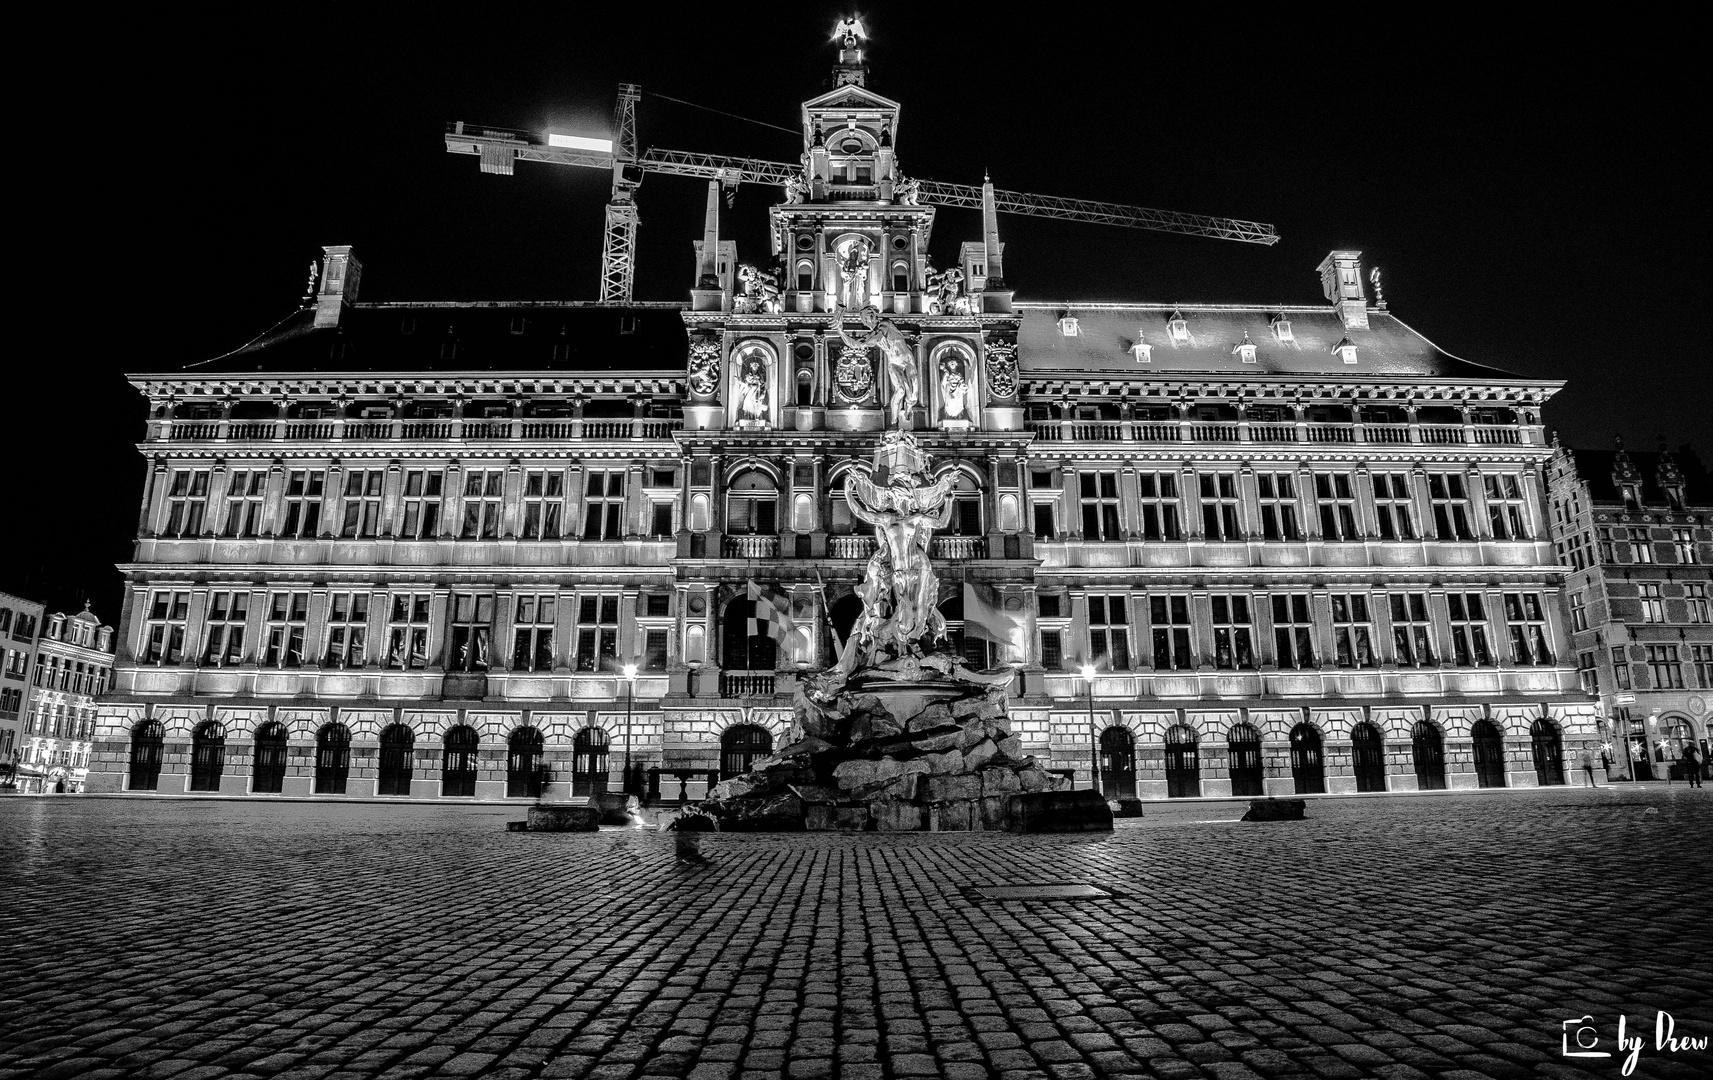 Antwerp at night